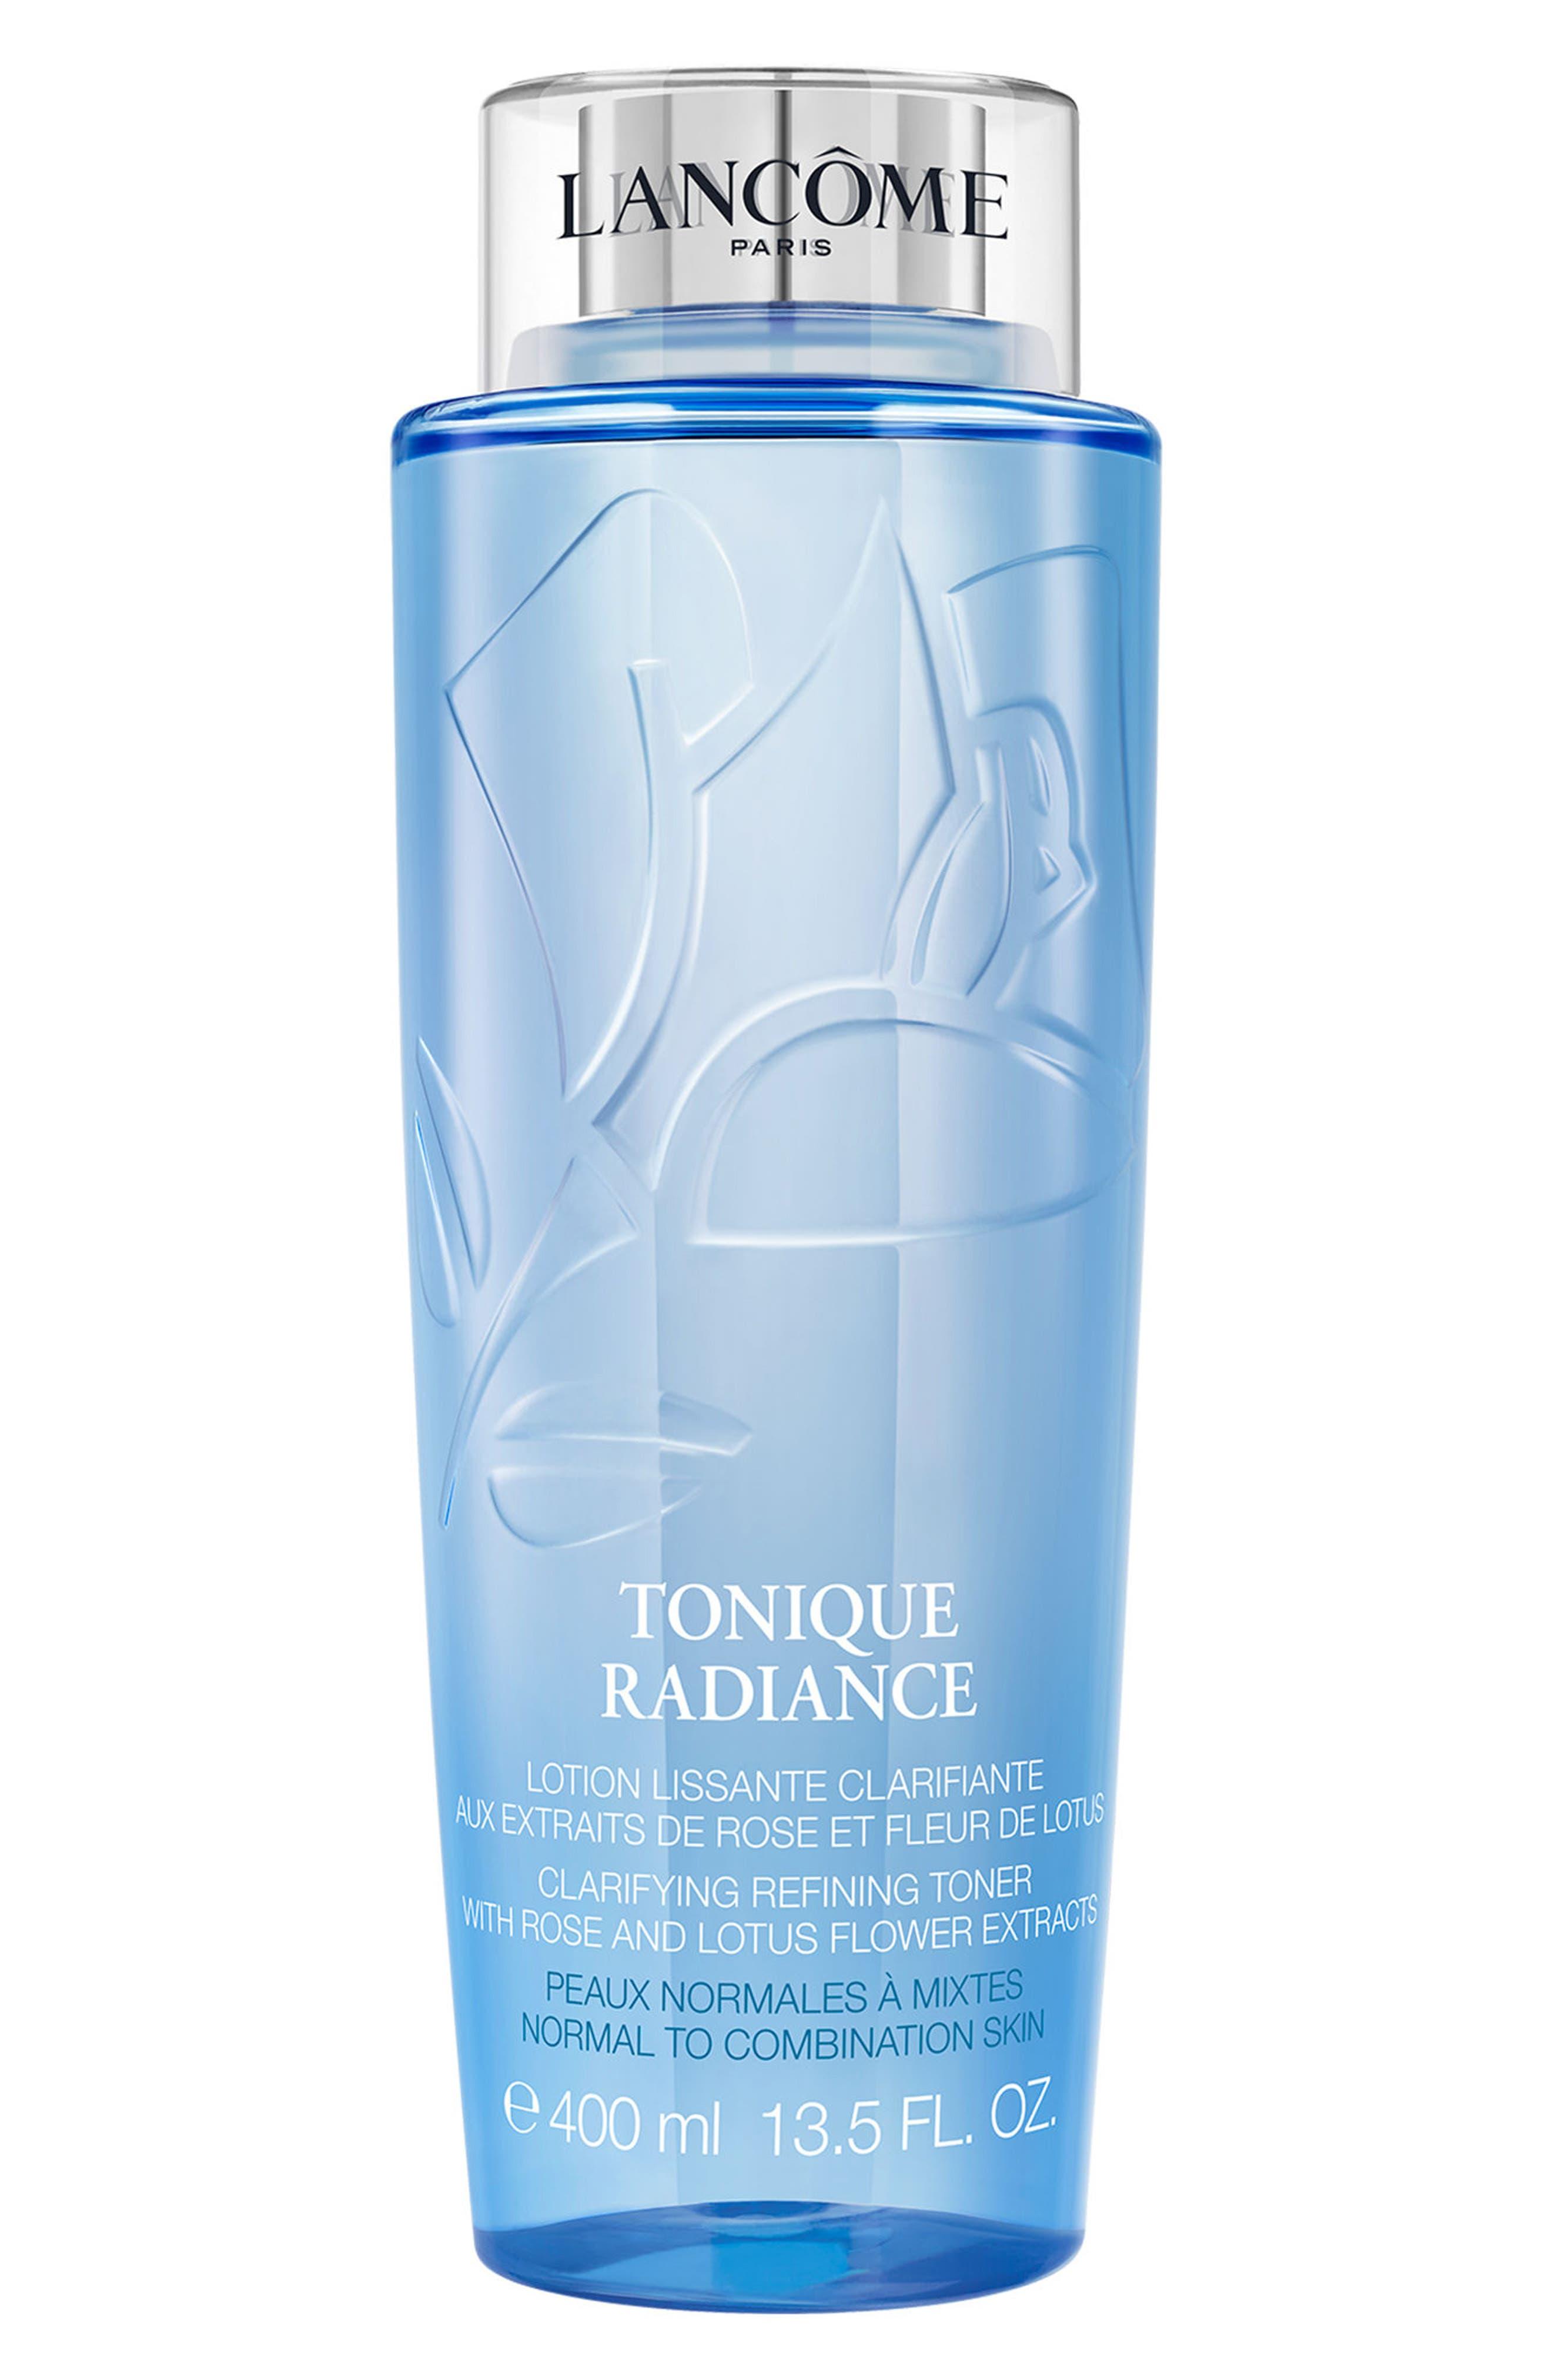 Lancôme Tonique Radiance Clarifying Exfoliating Toner (13.5 oz.) ($49 Value)